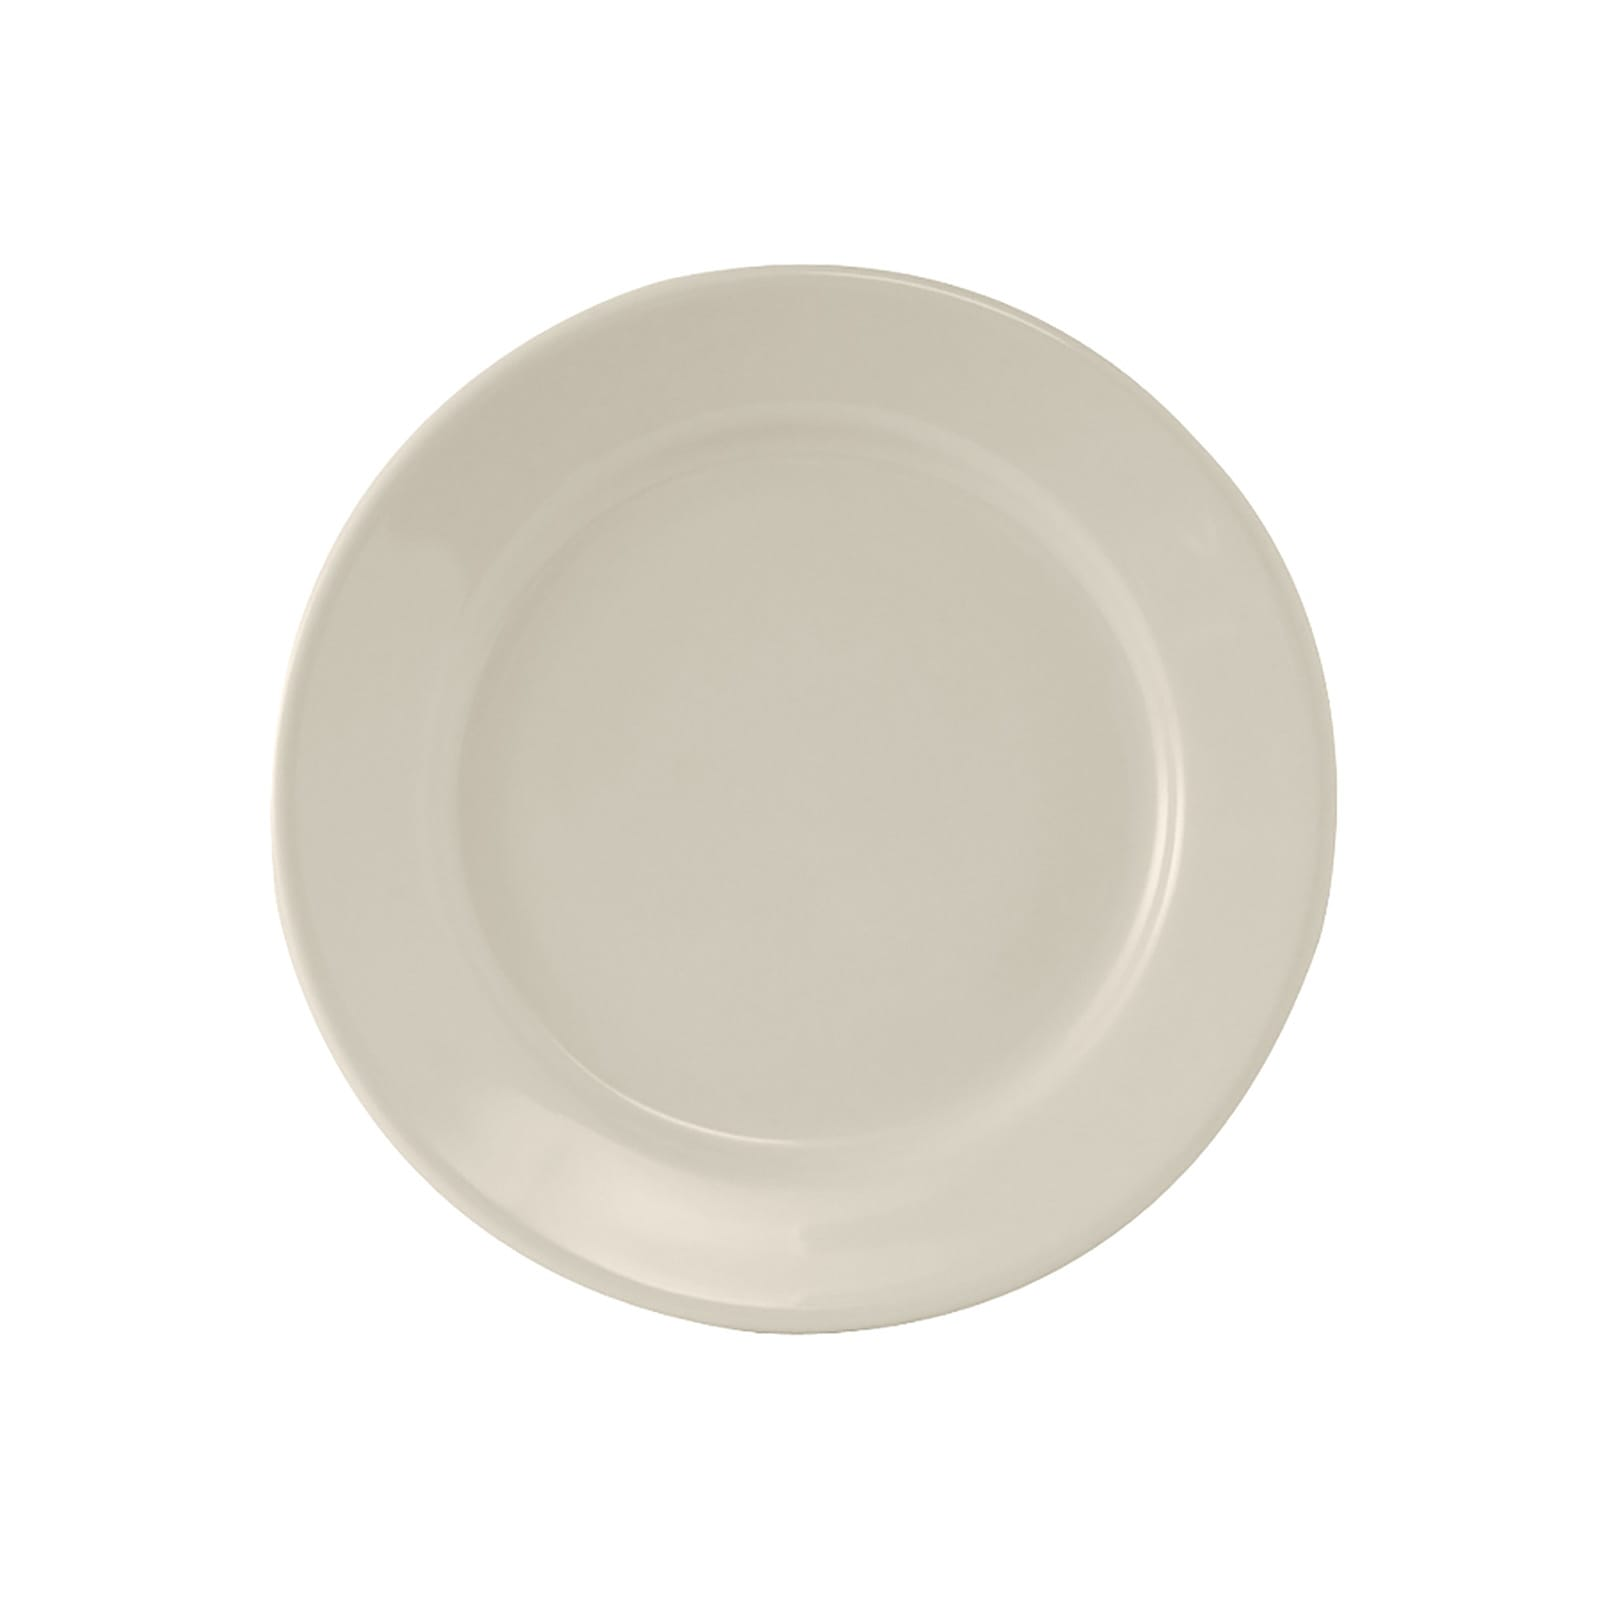 "Tuxton TRE-006 6.63"" Round Reno Plate - Ceramic, American White"